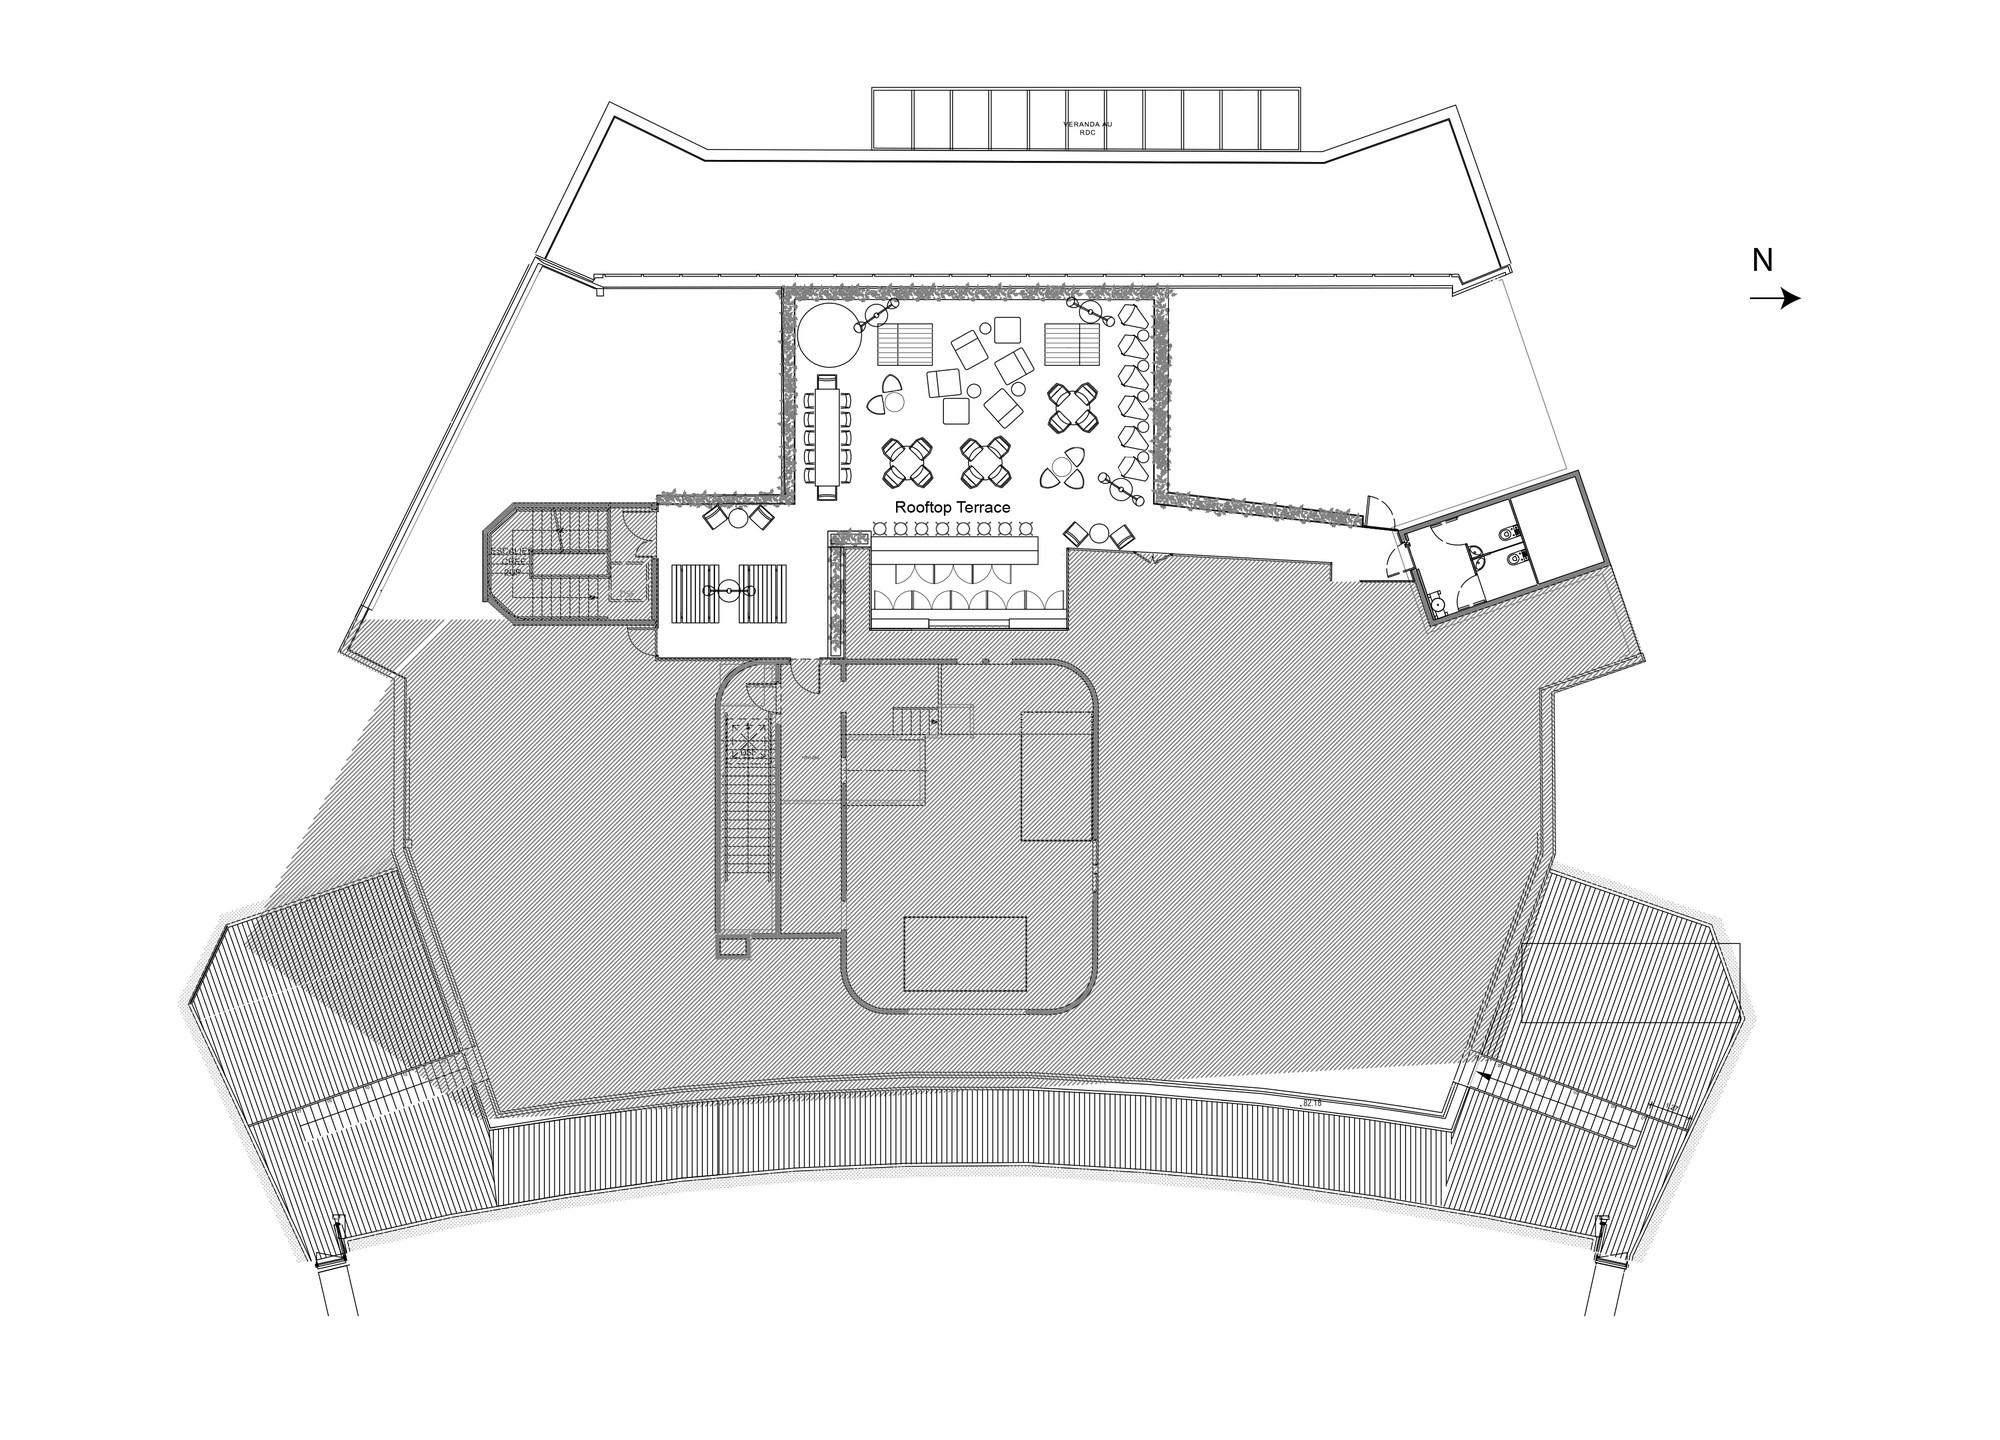 Gallery of Generator Paris DesignAgency 24